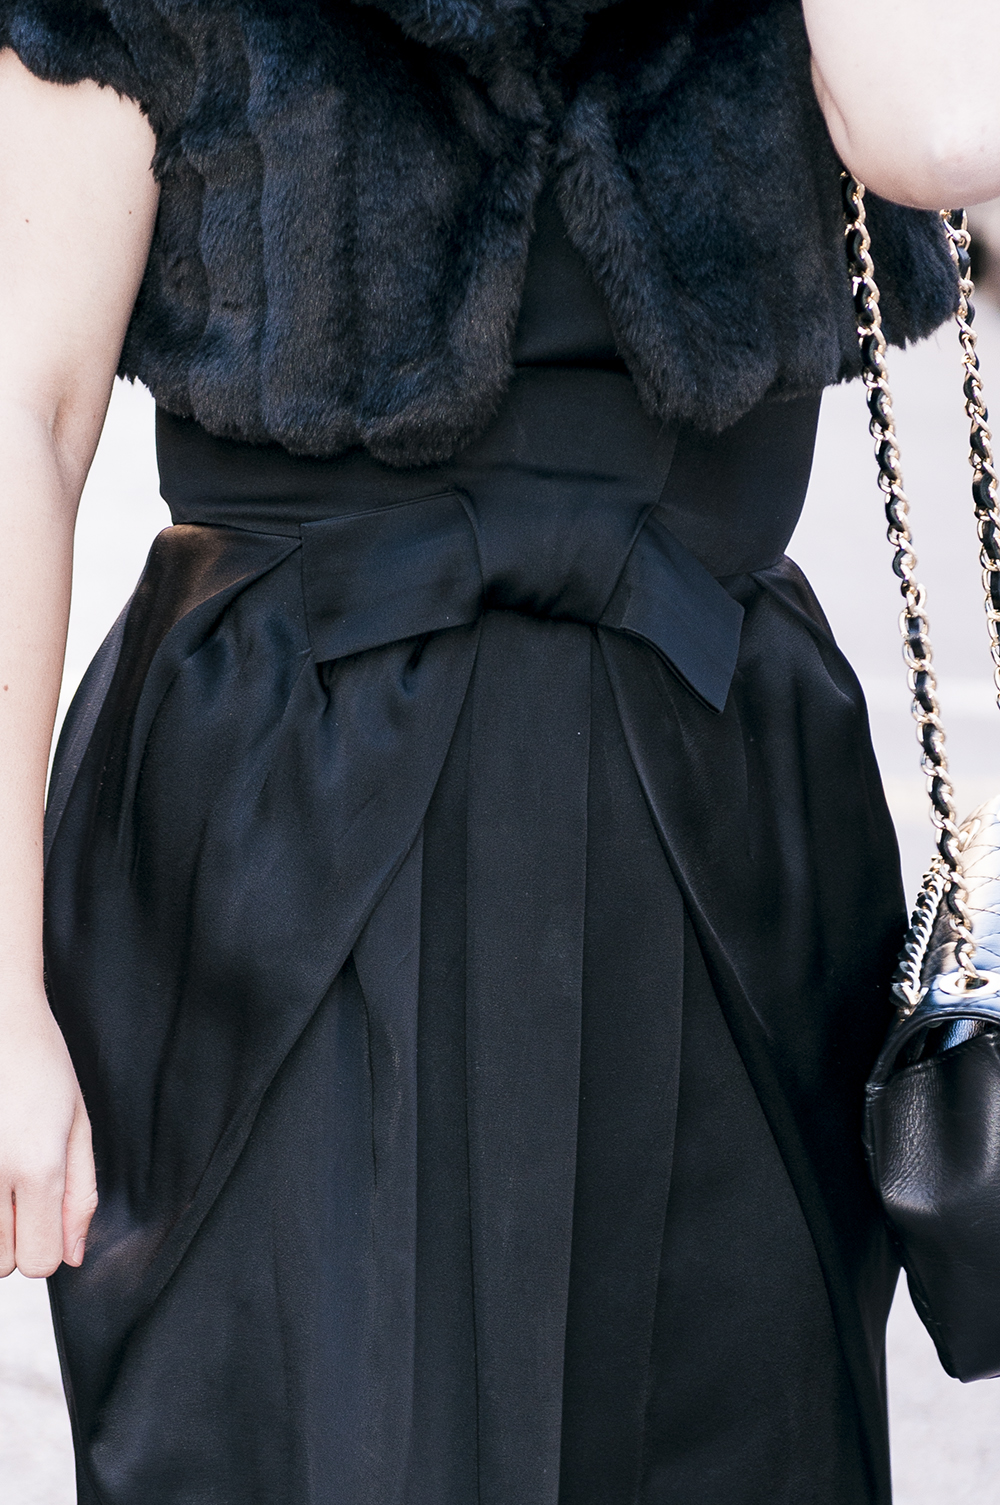 something fashion blogger valencia spain influencer firenze Dior LBD vintage dress _0355